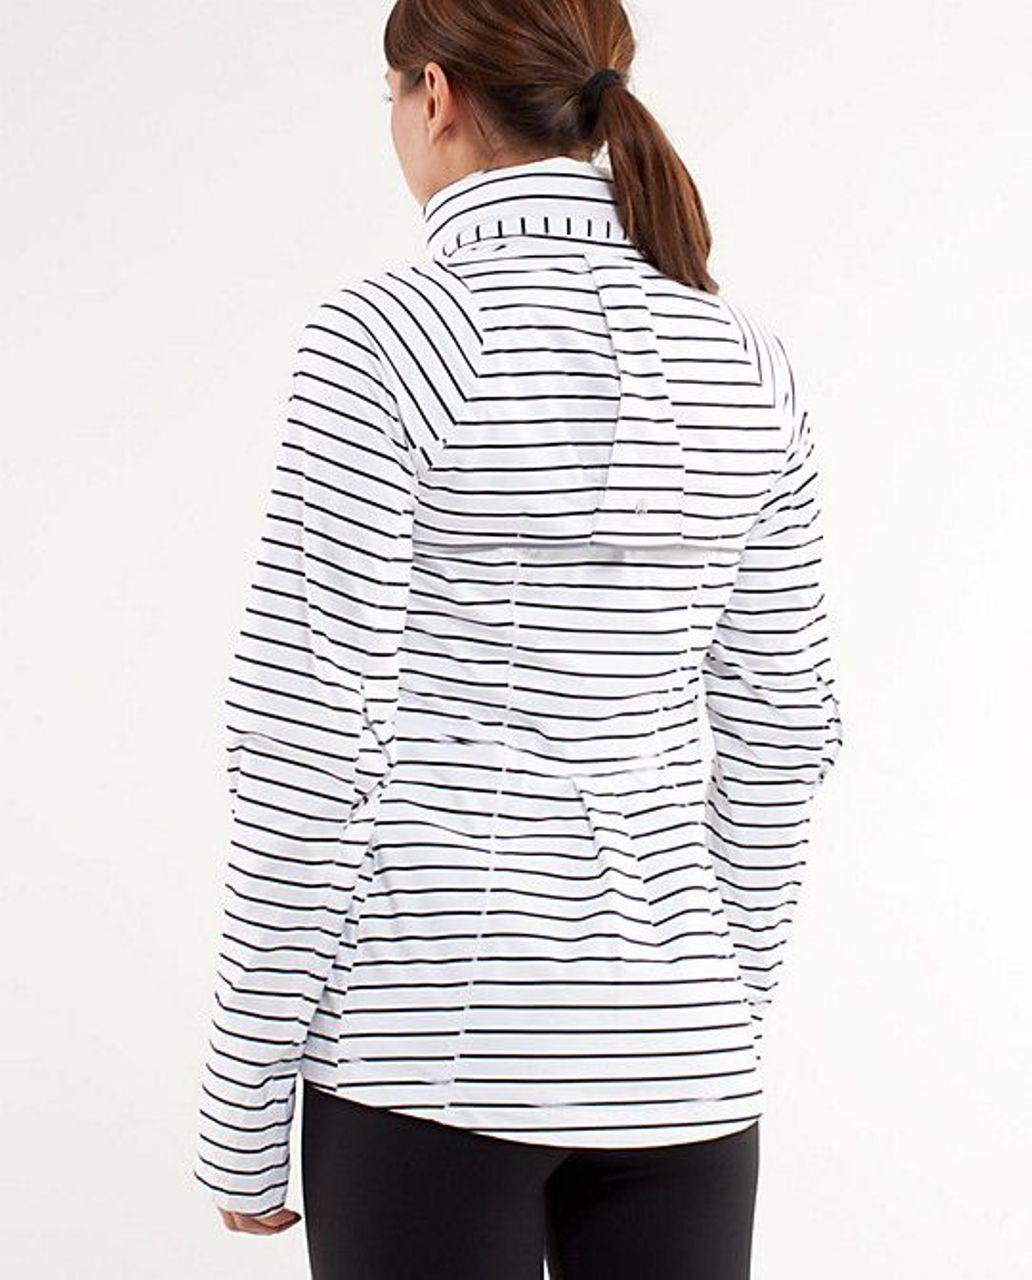 Lululemon Run:  In The Rain Jacket - Quiet Stripe White Deep Indigo